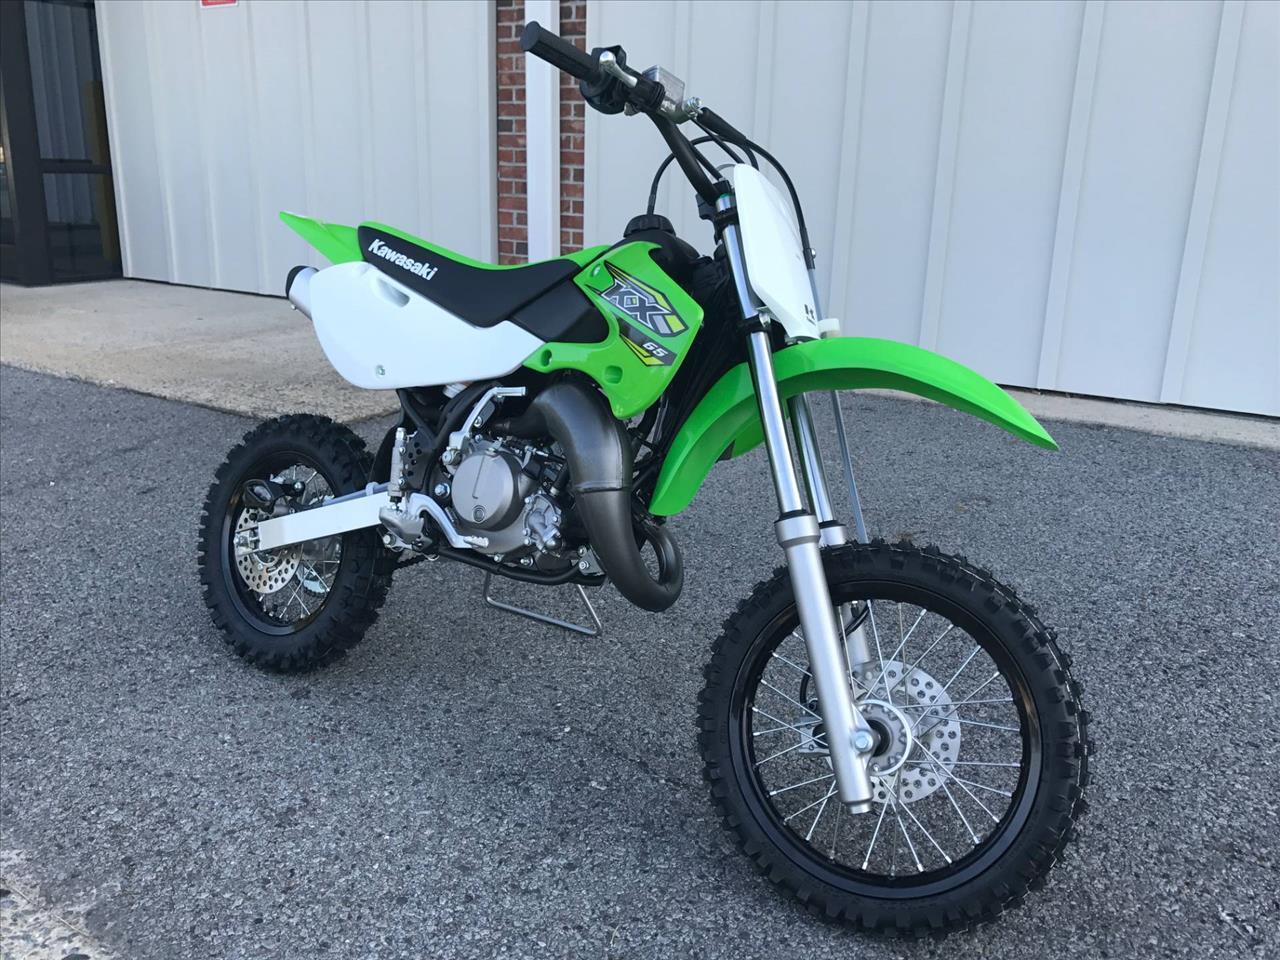 2018 Kawasaki KX 65 for sale at Vehicle Network, LLC - Ron Ayers Motorsports in Greenville NC